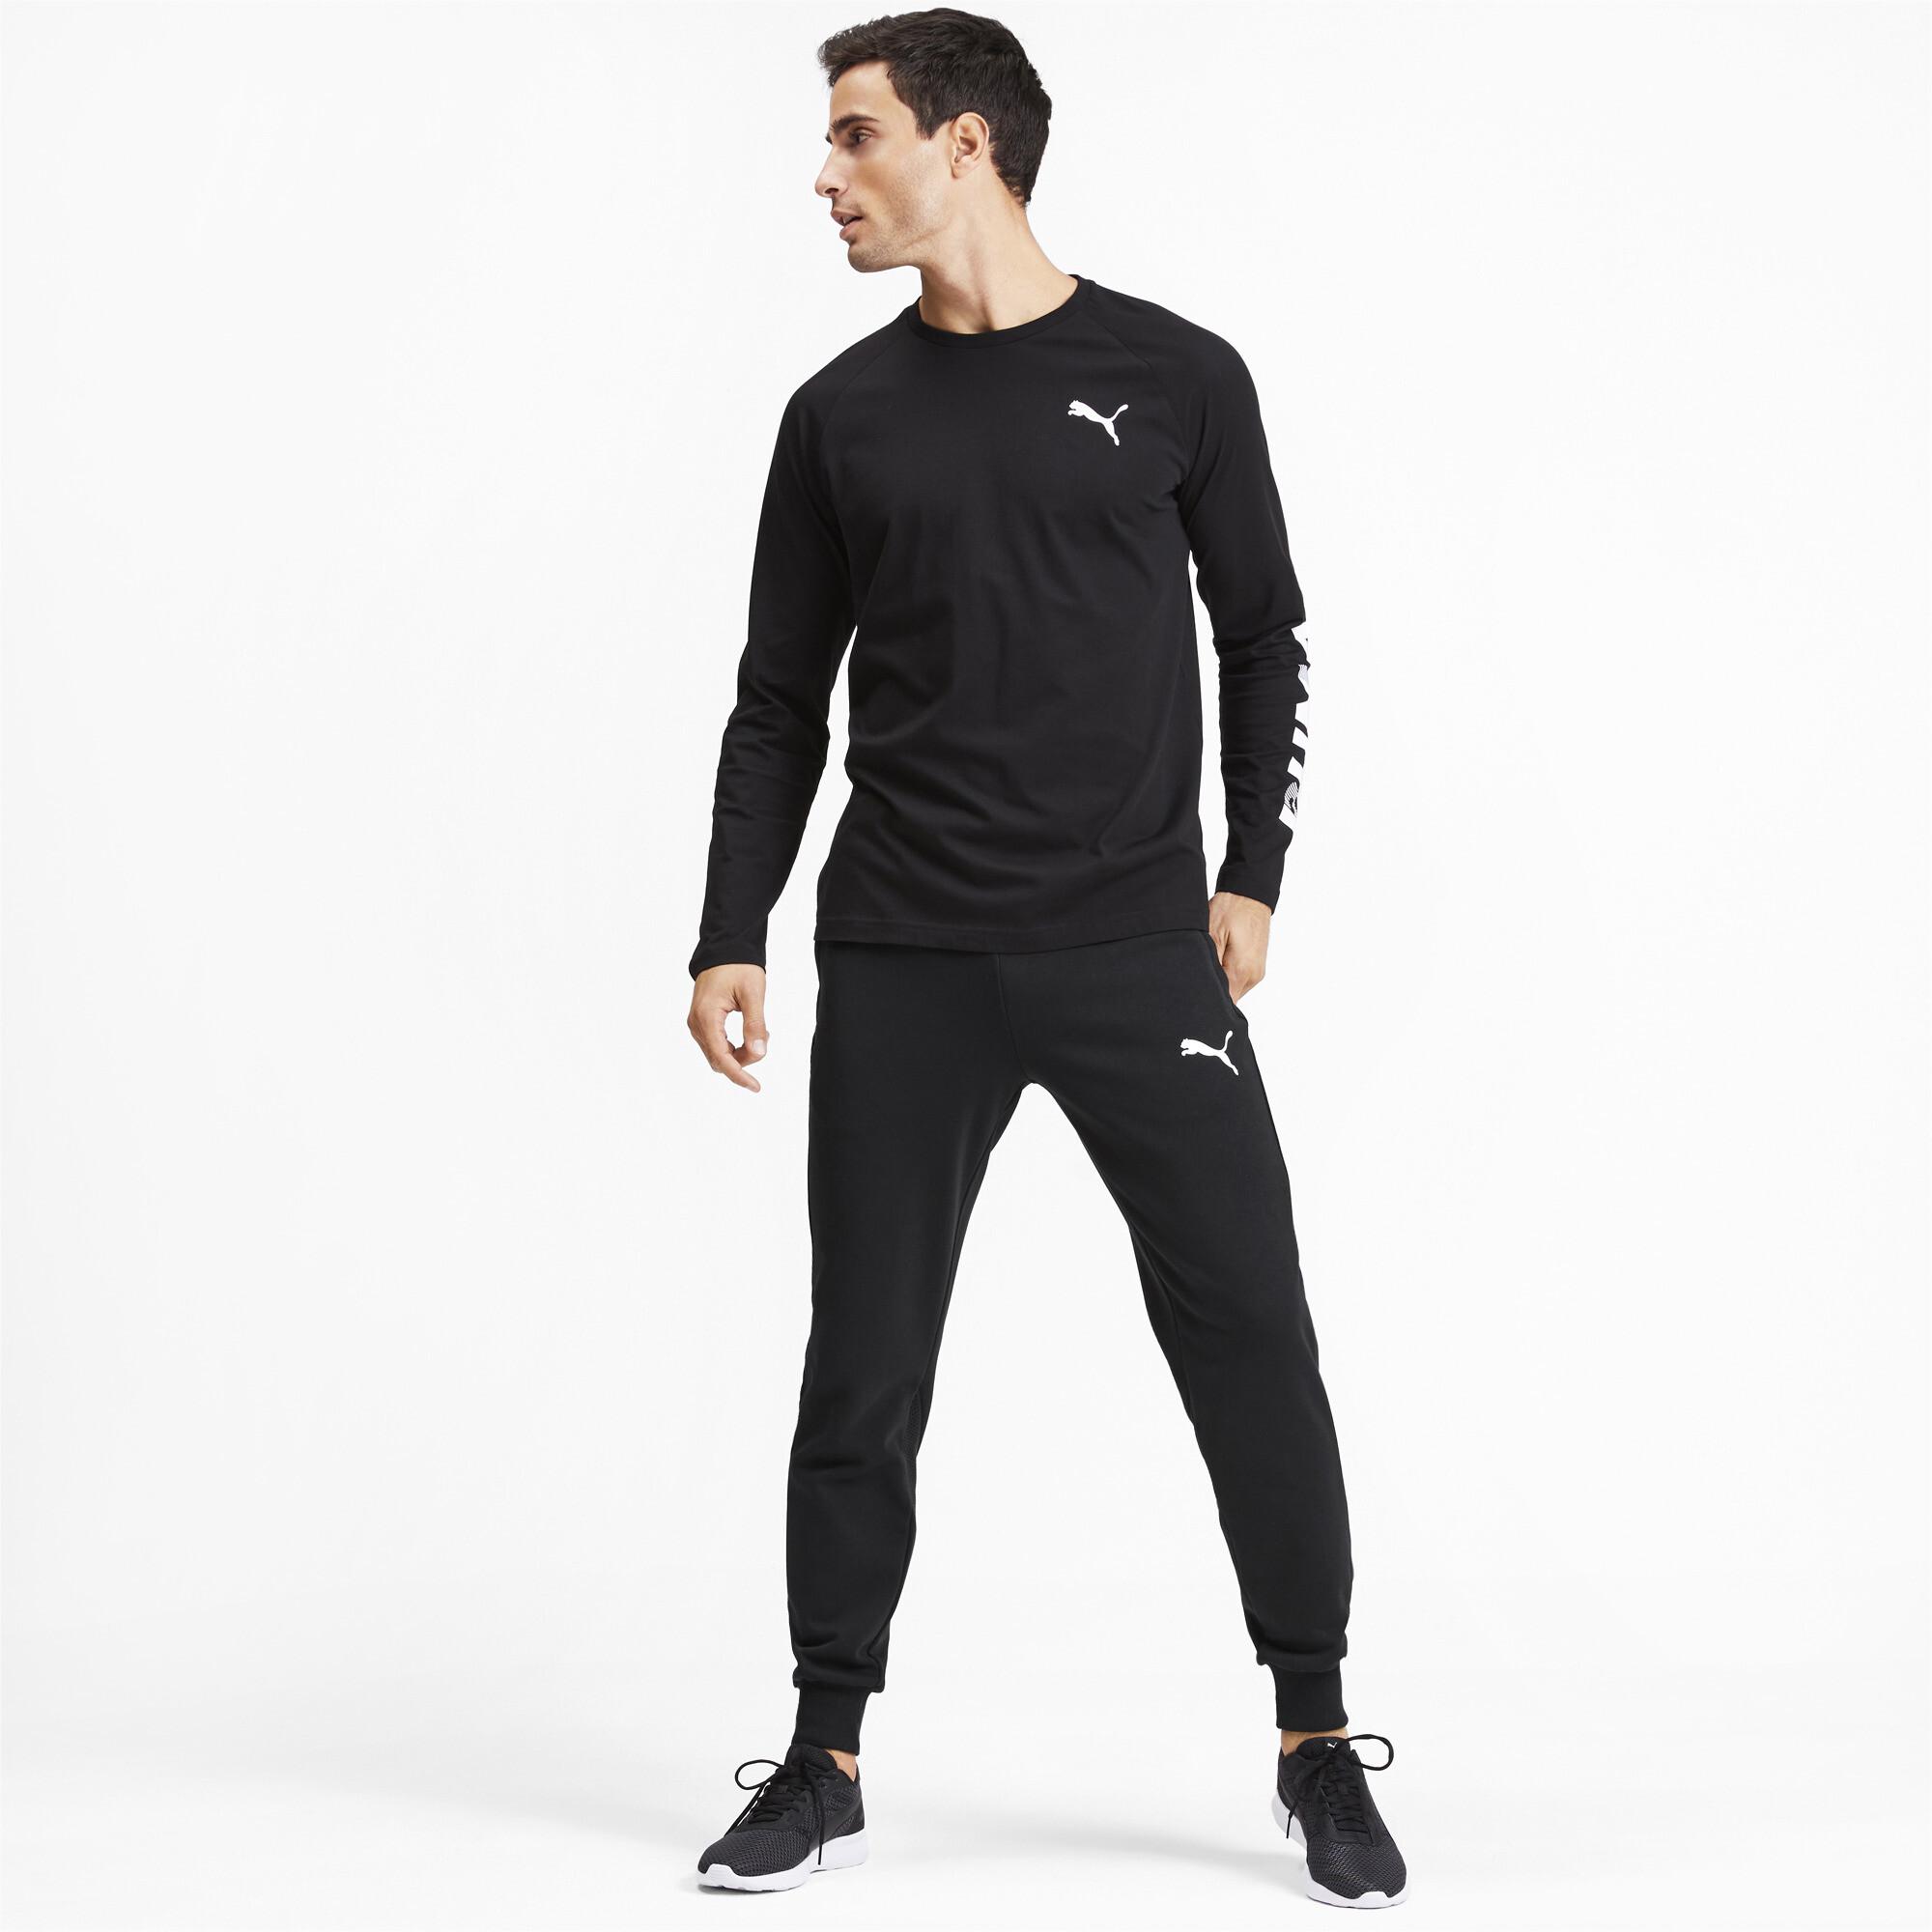 PUMA-Modern-Sports-Men-039-s-Sweatpants-Men-Knitted-Pants-Basics thumbnail 11